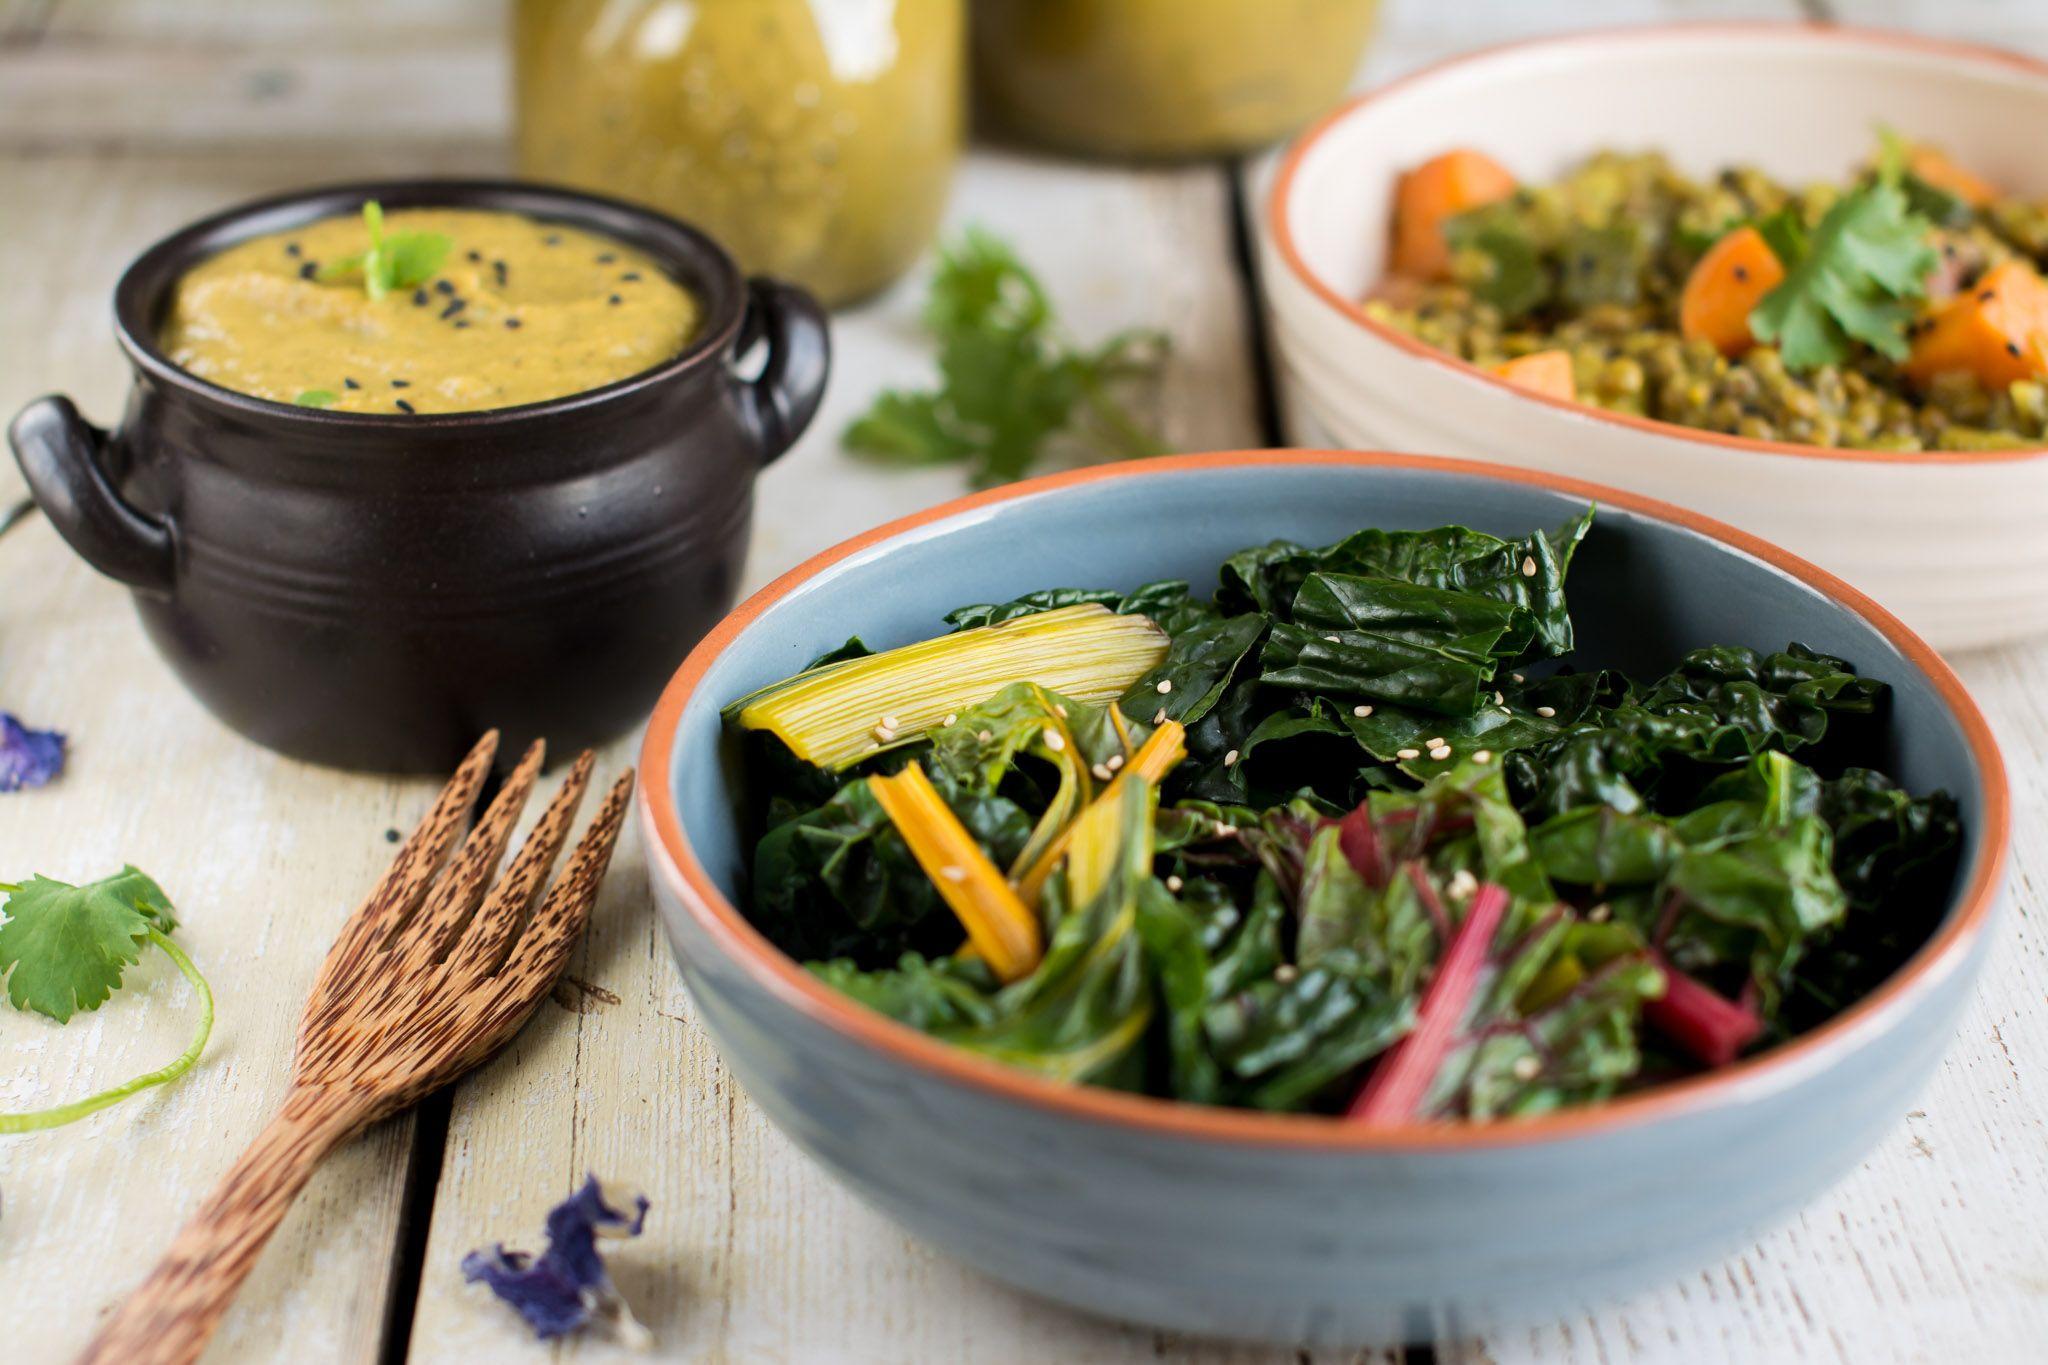 Vegan Salad Dressing with Oven Roasted Veggies Recipe